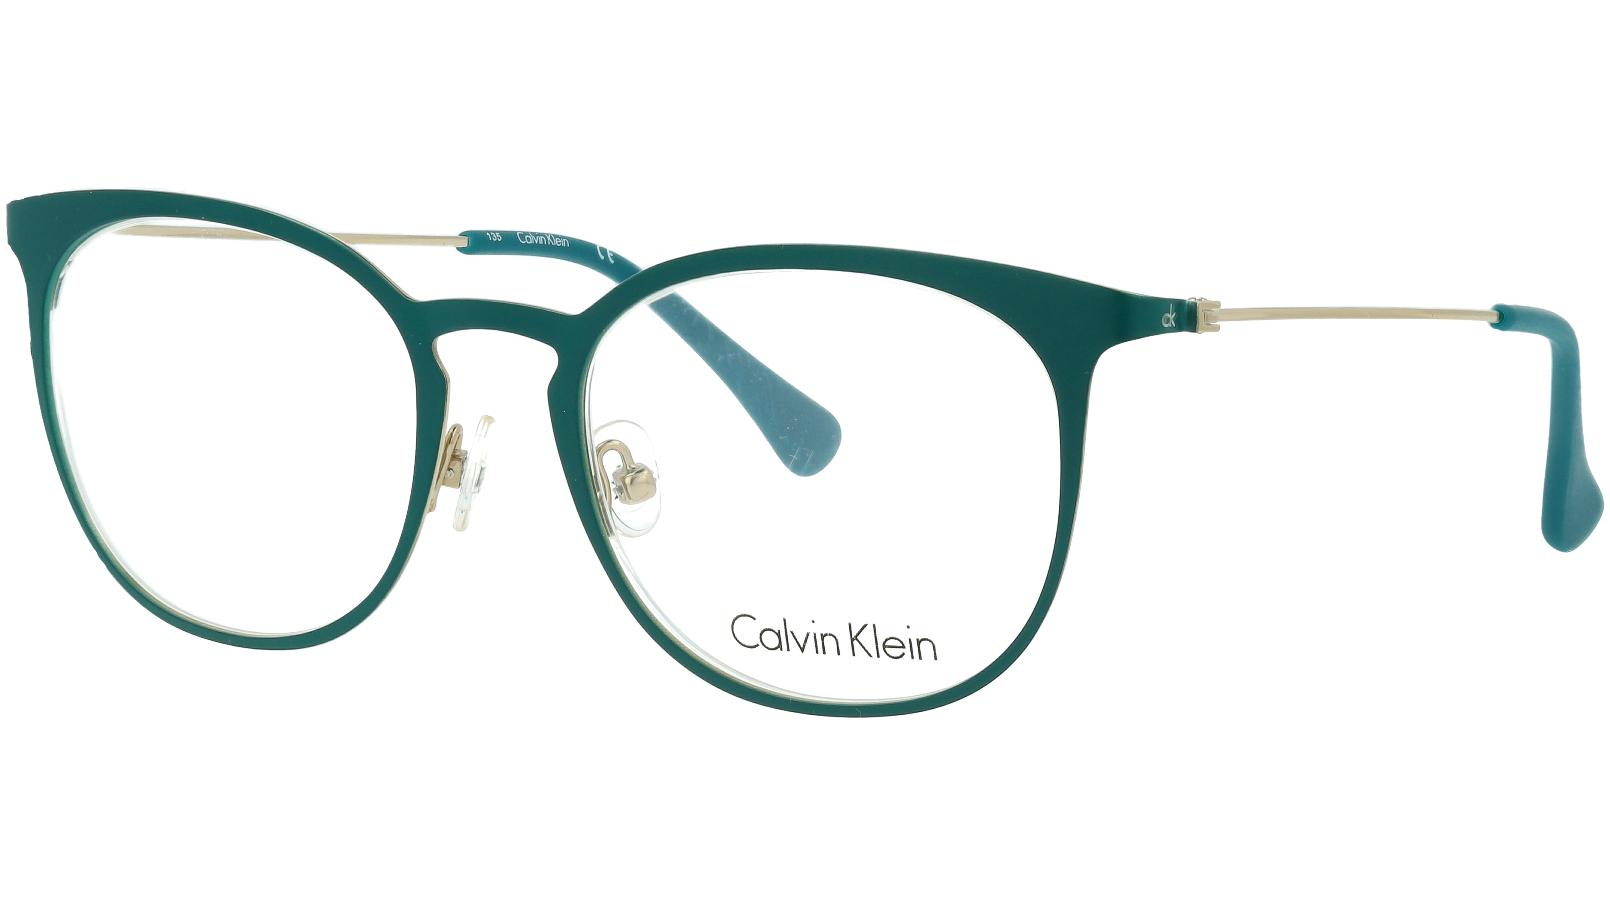 CALVIN KLEIN CK5430 431 50 GREEN Glasses